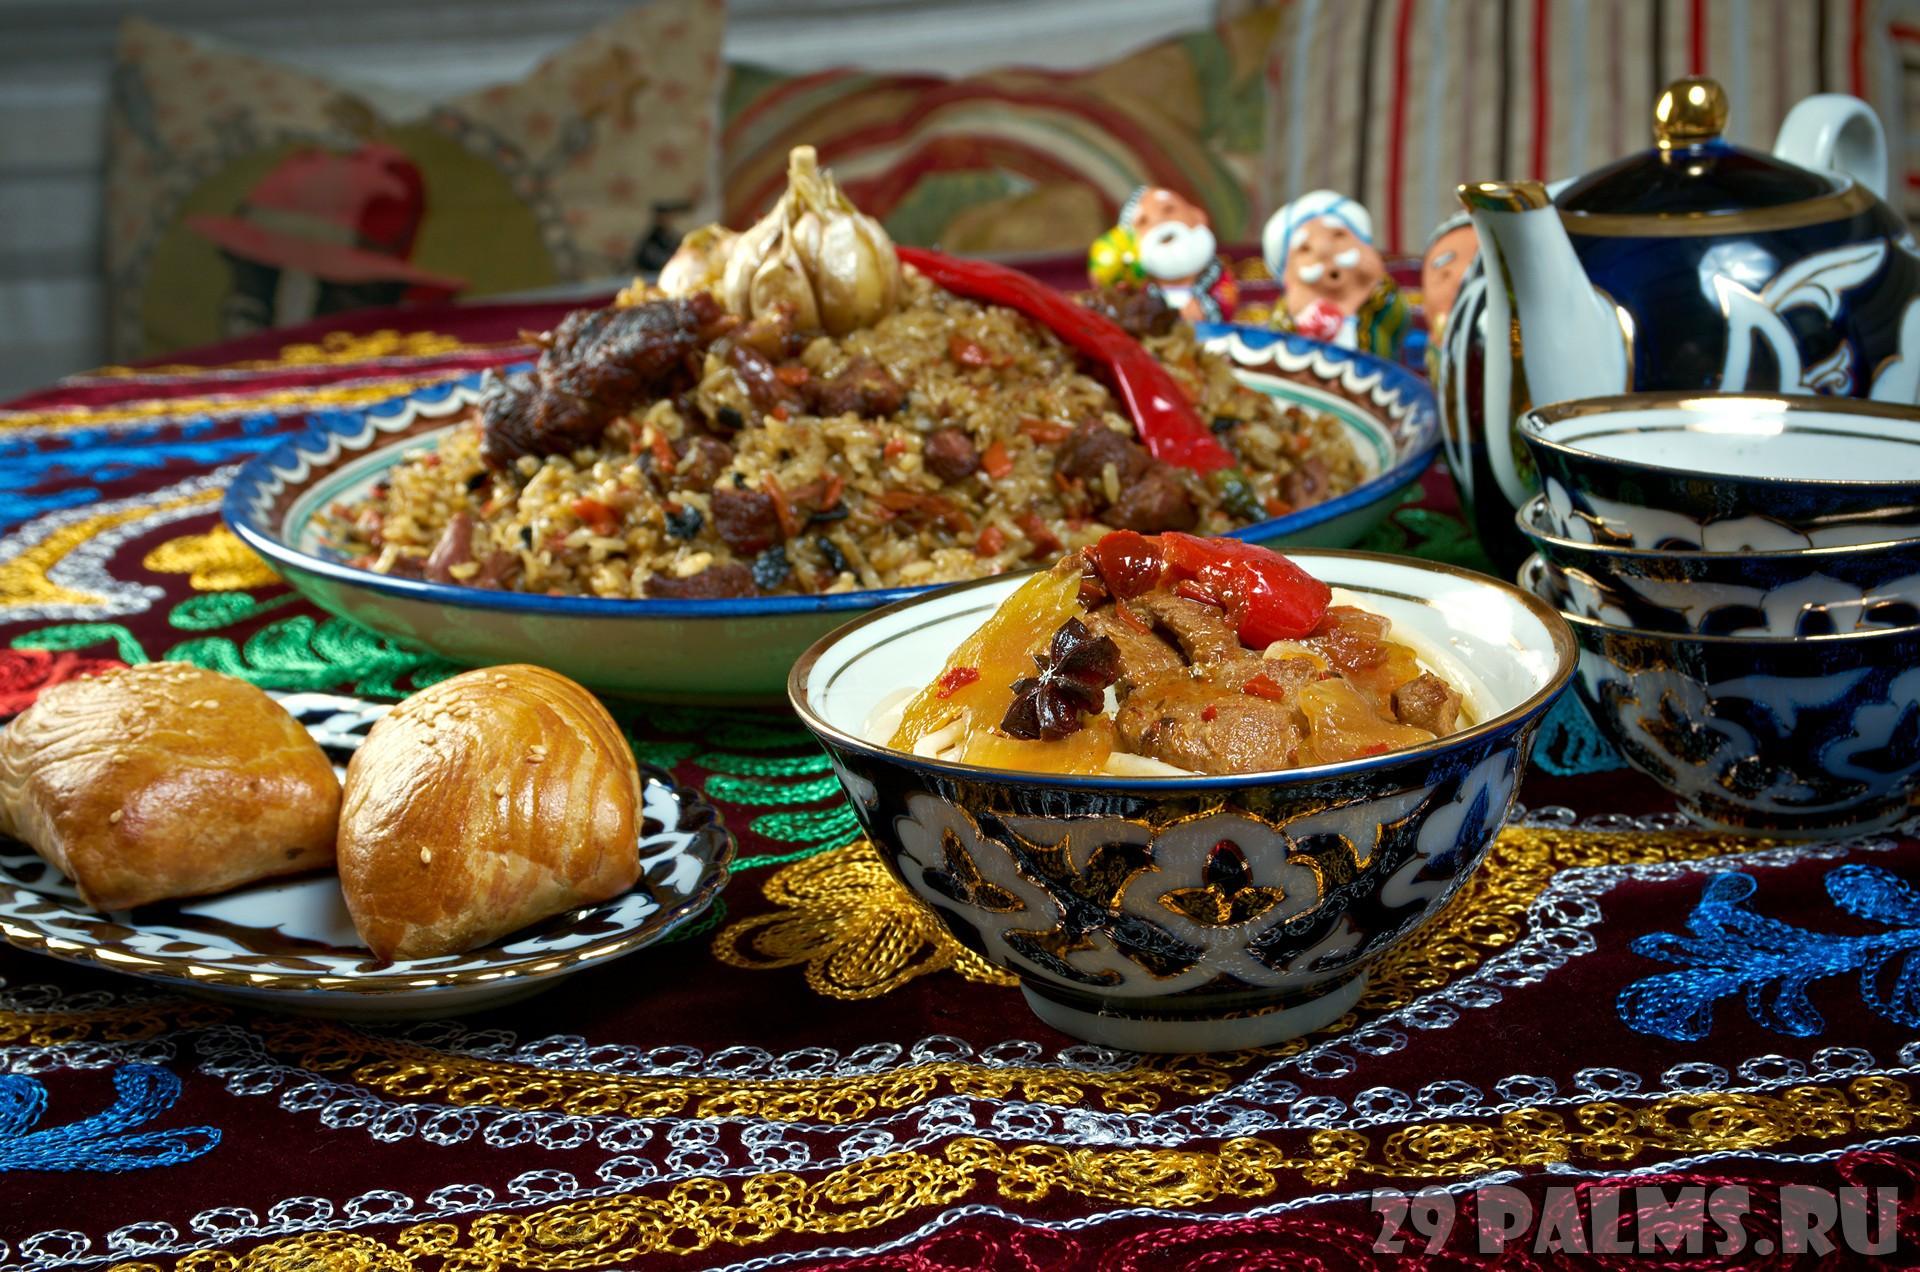 Фото новогодние праздники в ташкенте 3